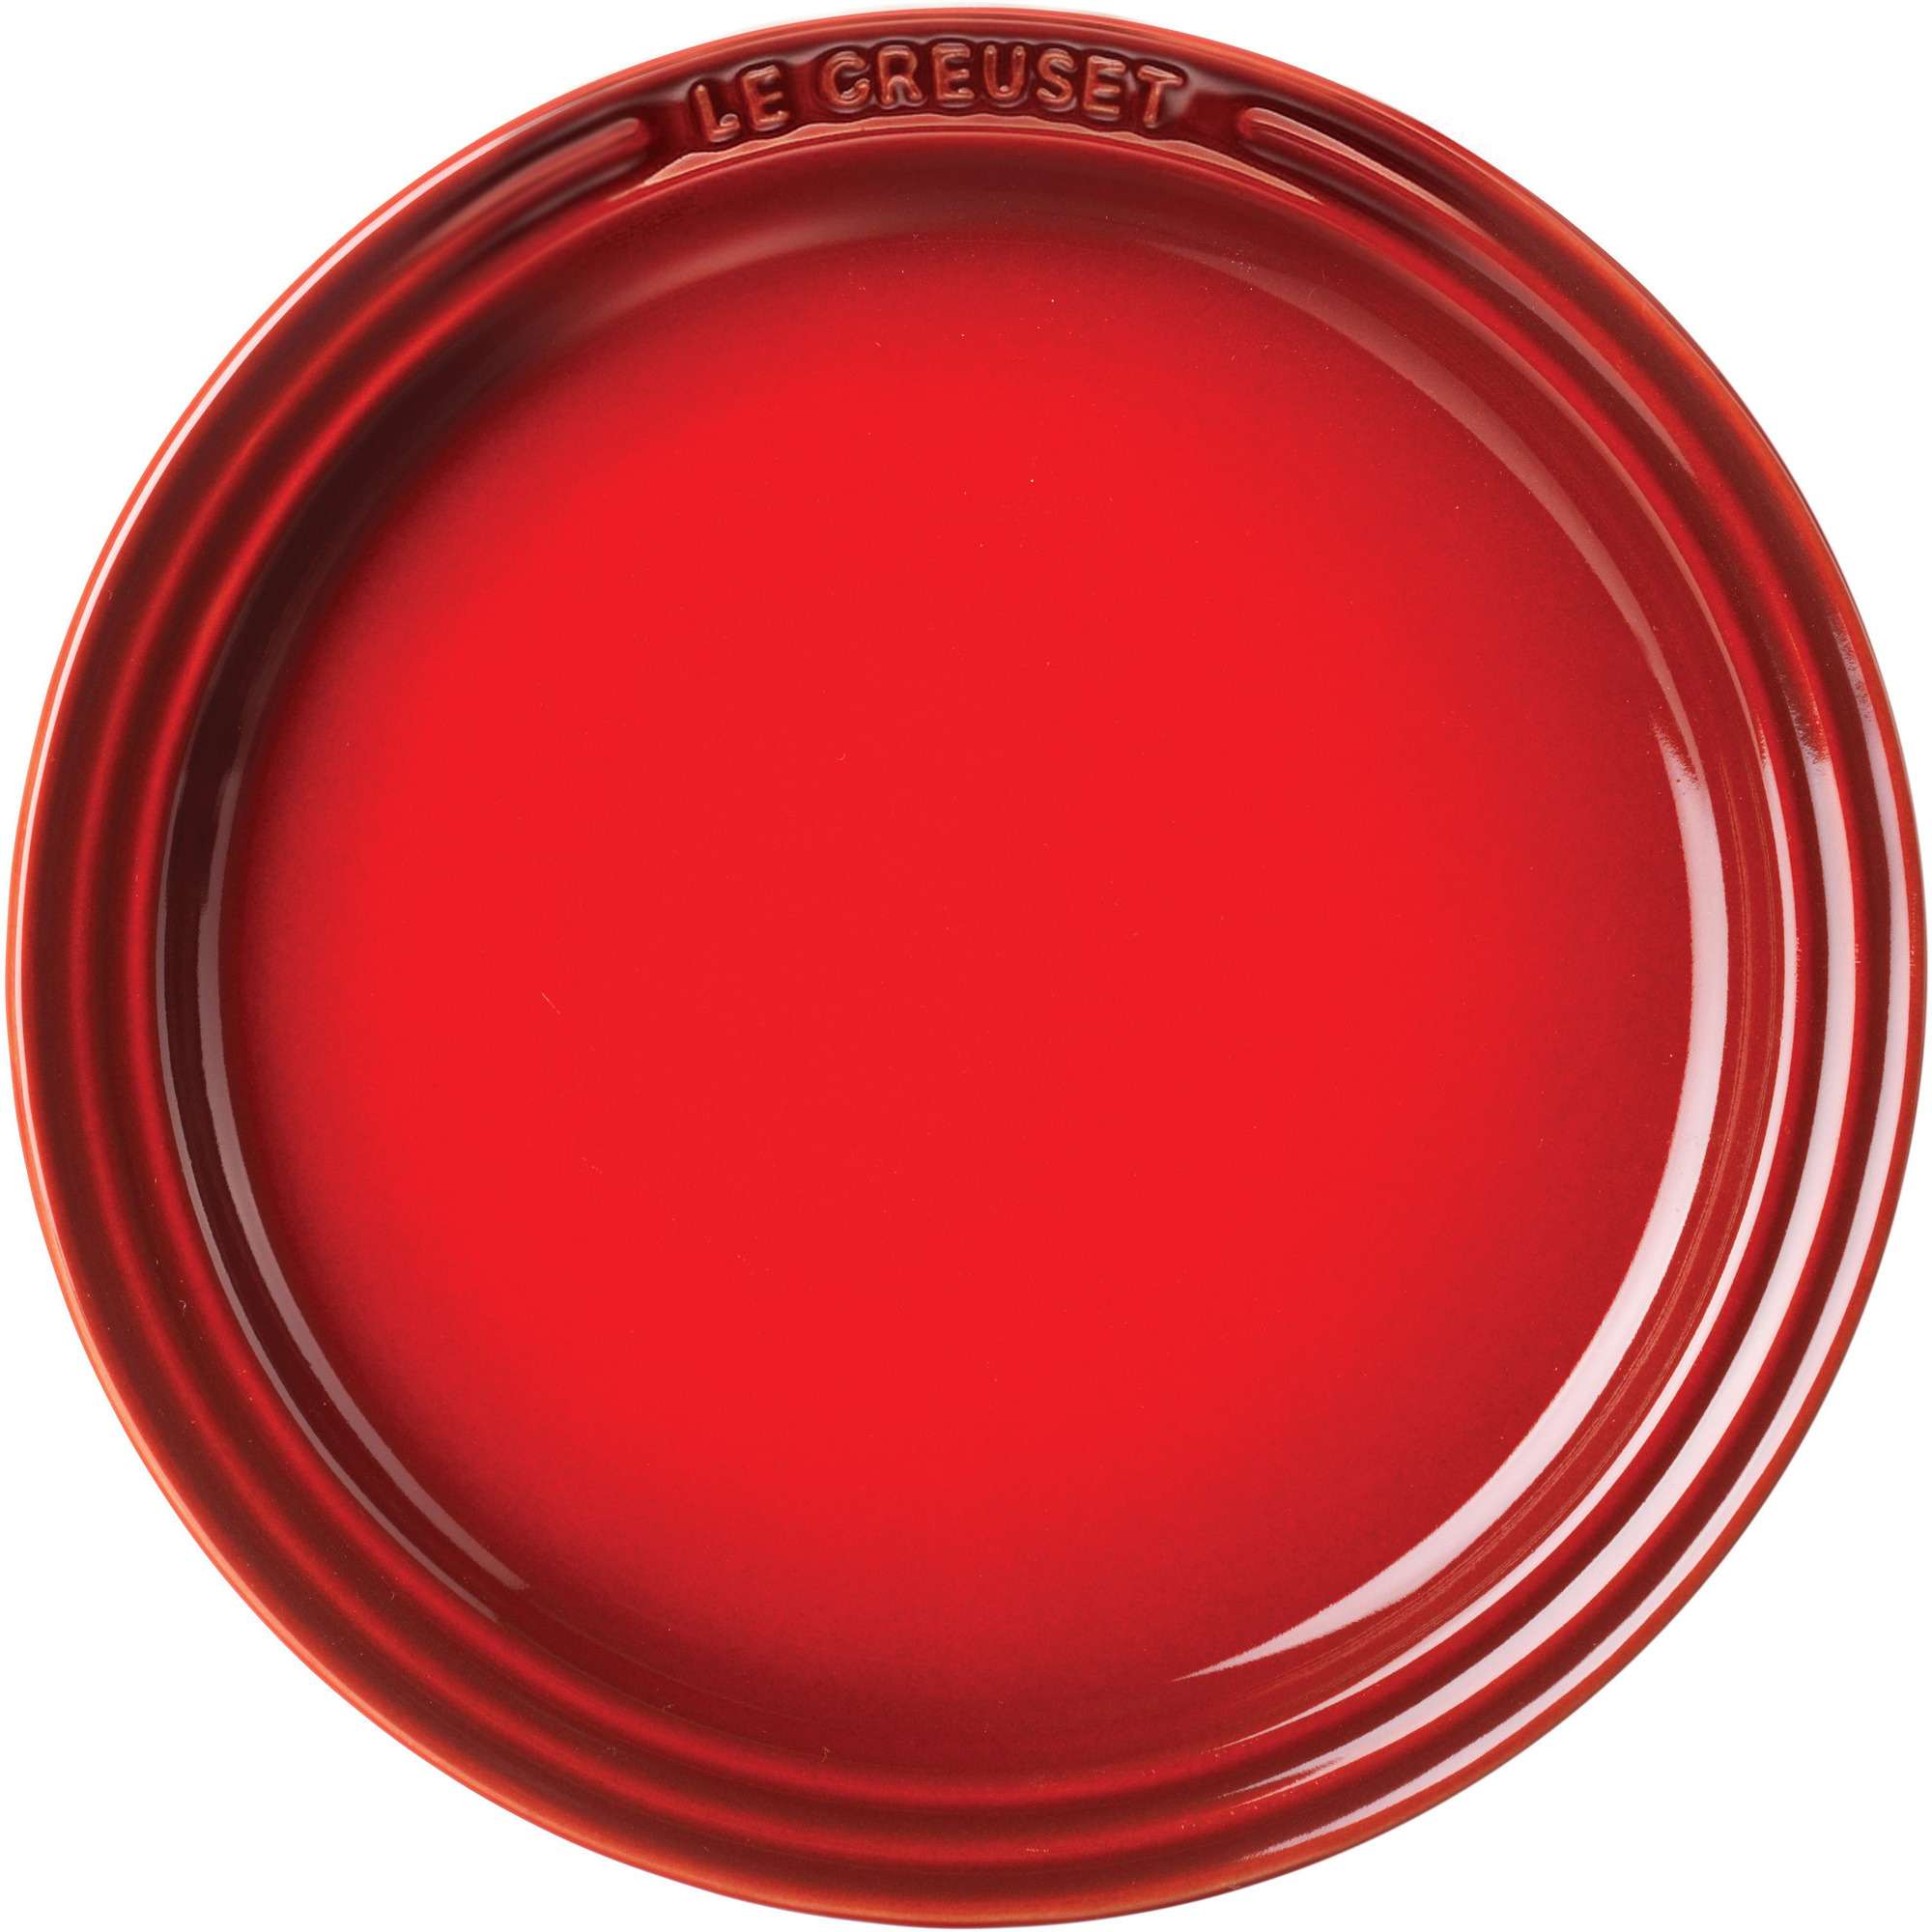 Le Creuset Tallrik 18 cm Röd